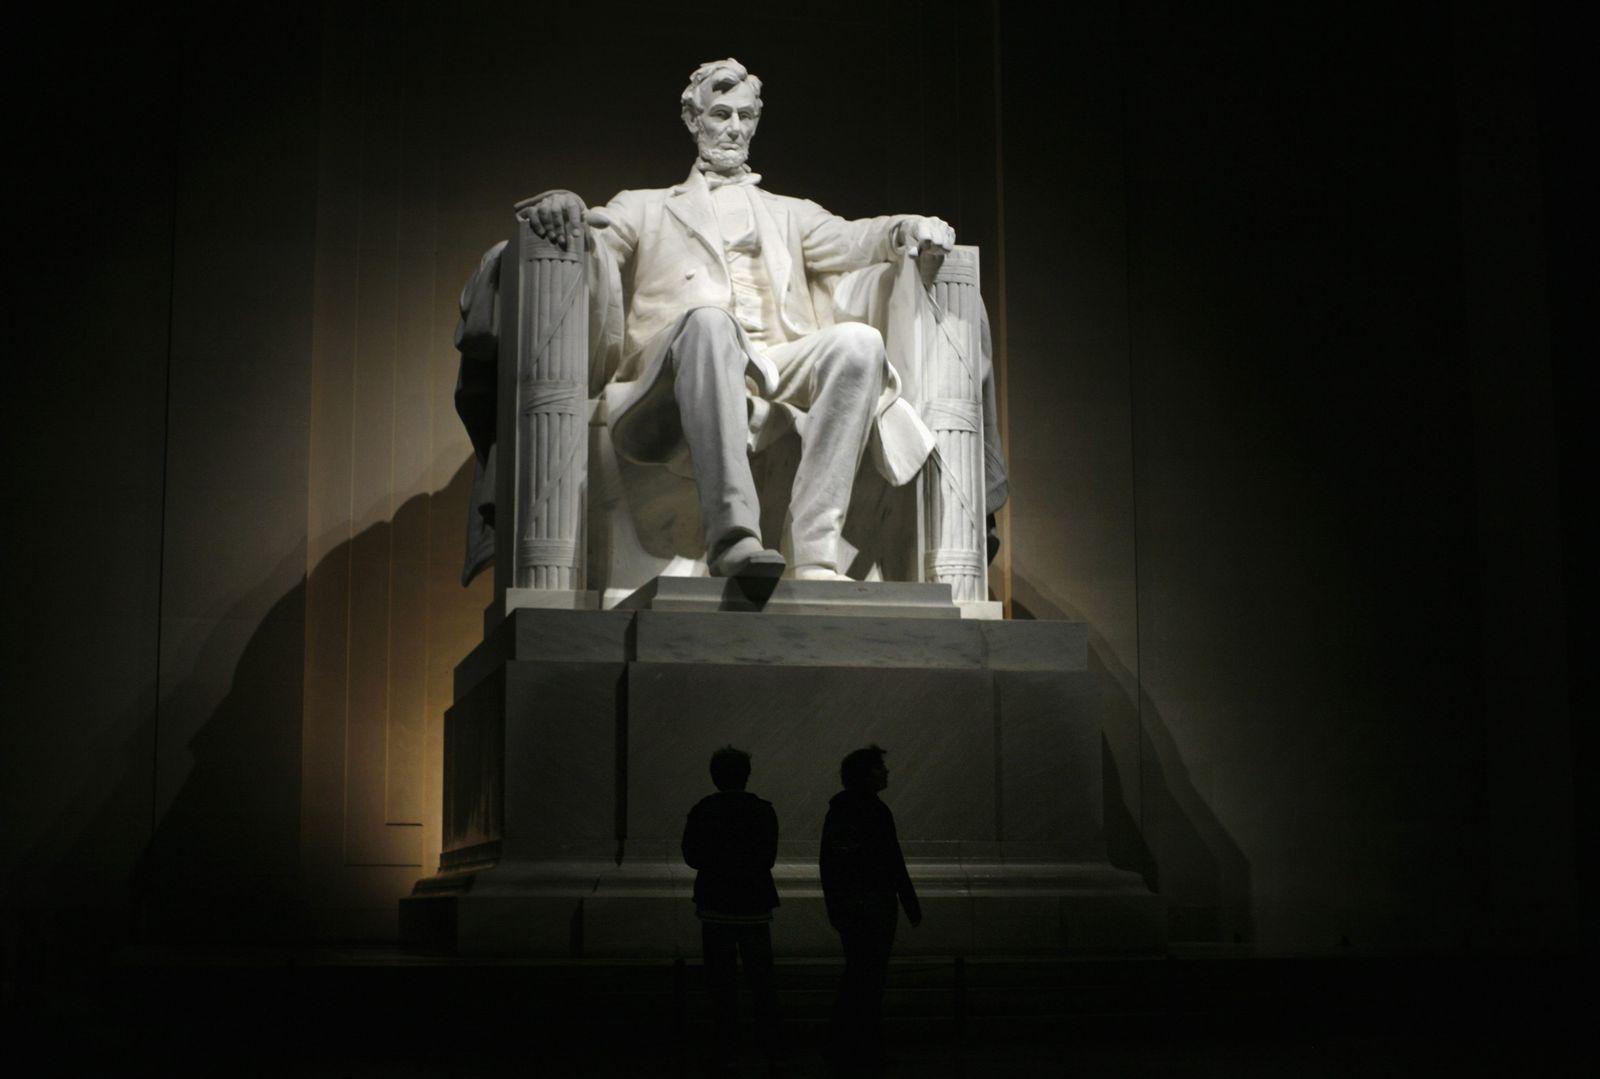 Washington / Abraham Lincoln / Memorial